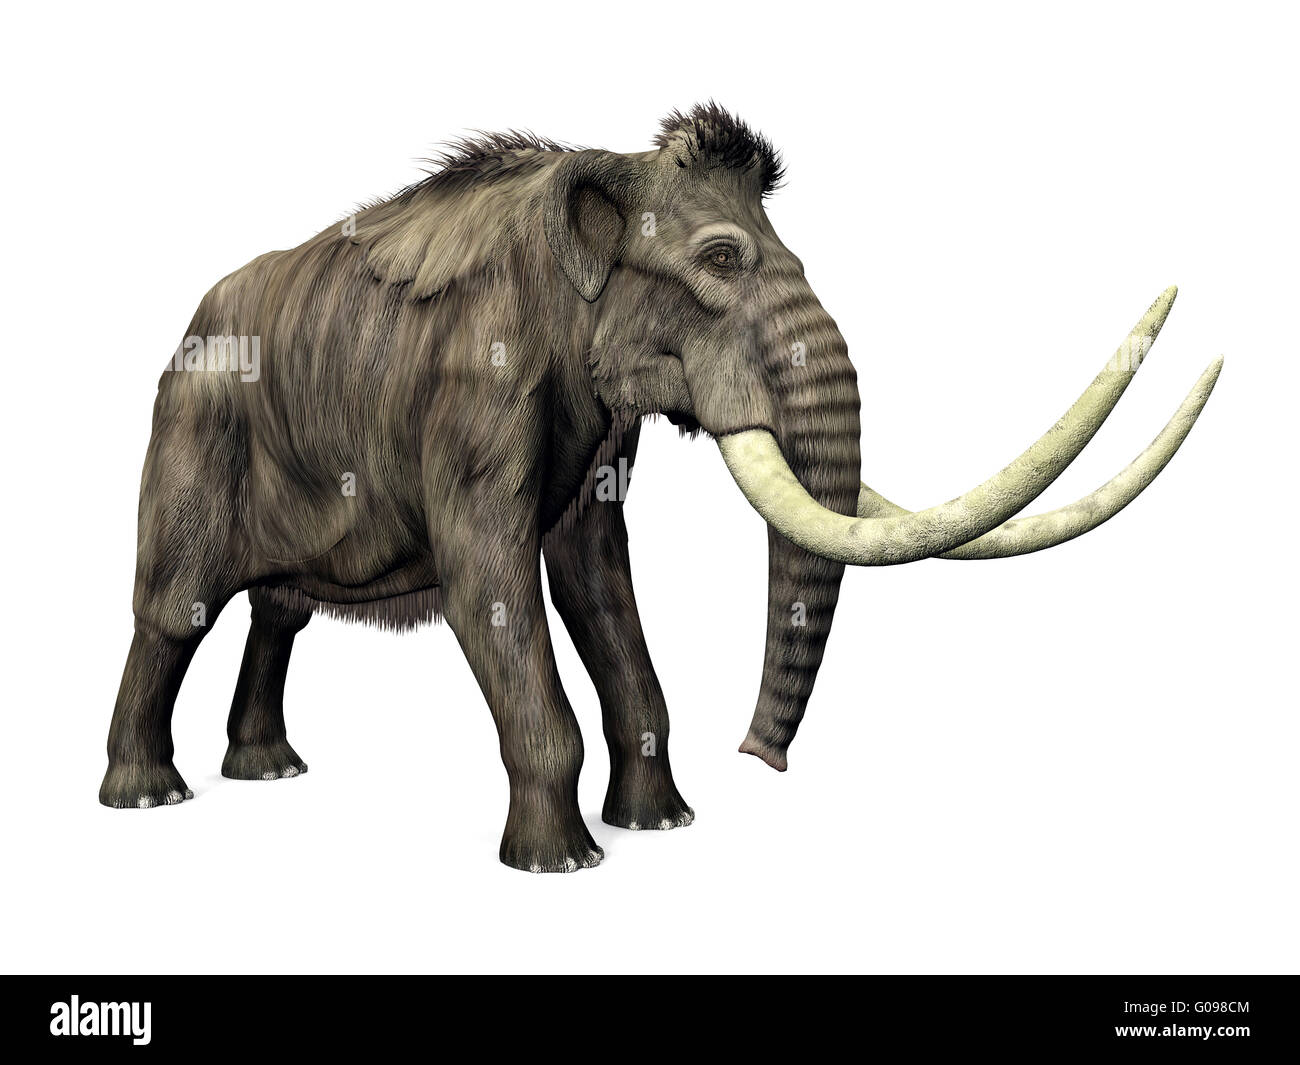 Mammoth - Stock Image